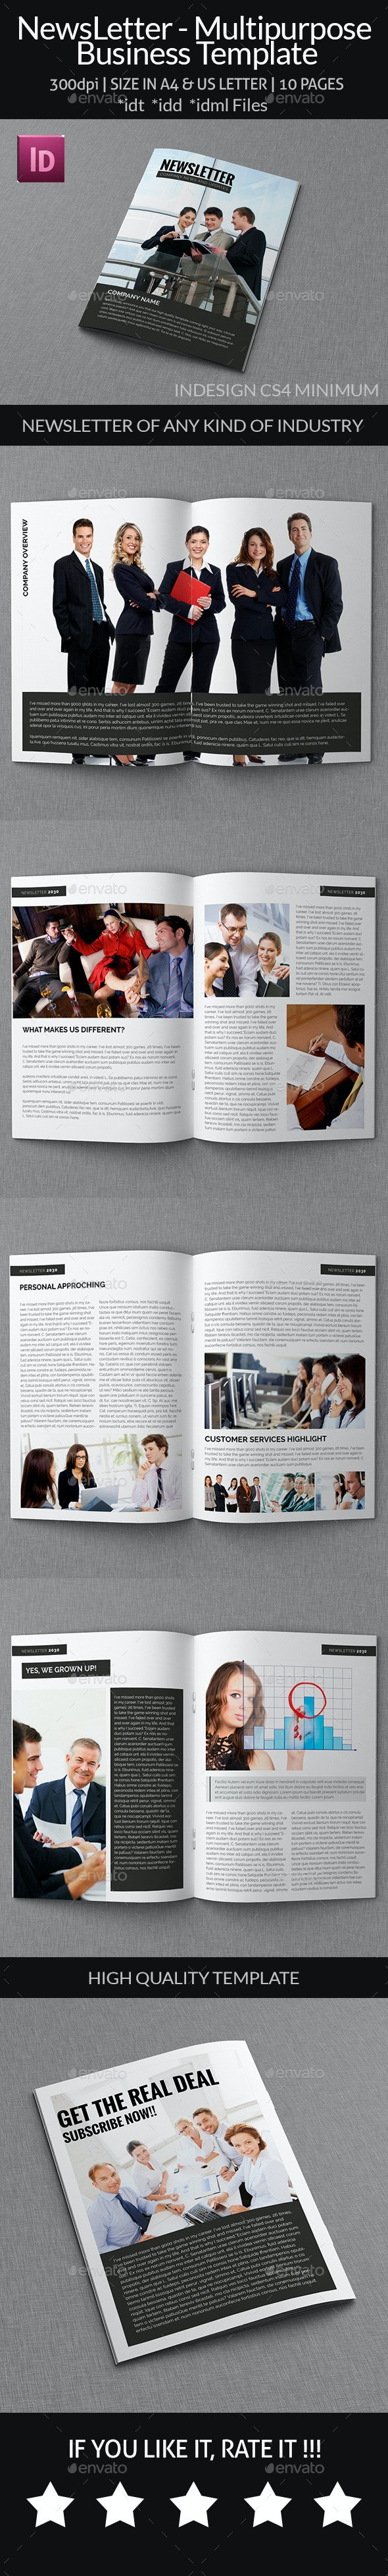 NewsLetter - Multipurpose Business Template - Newsletters Print Templates